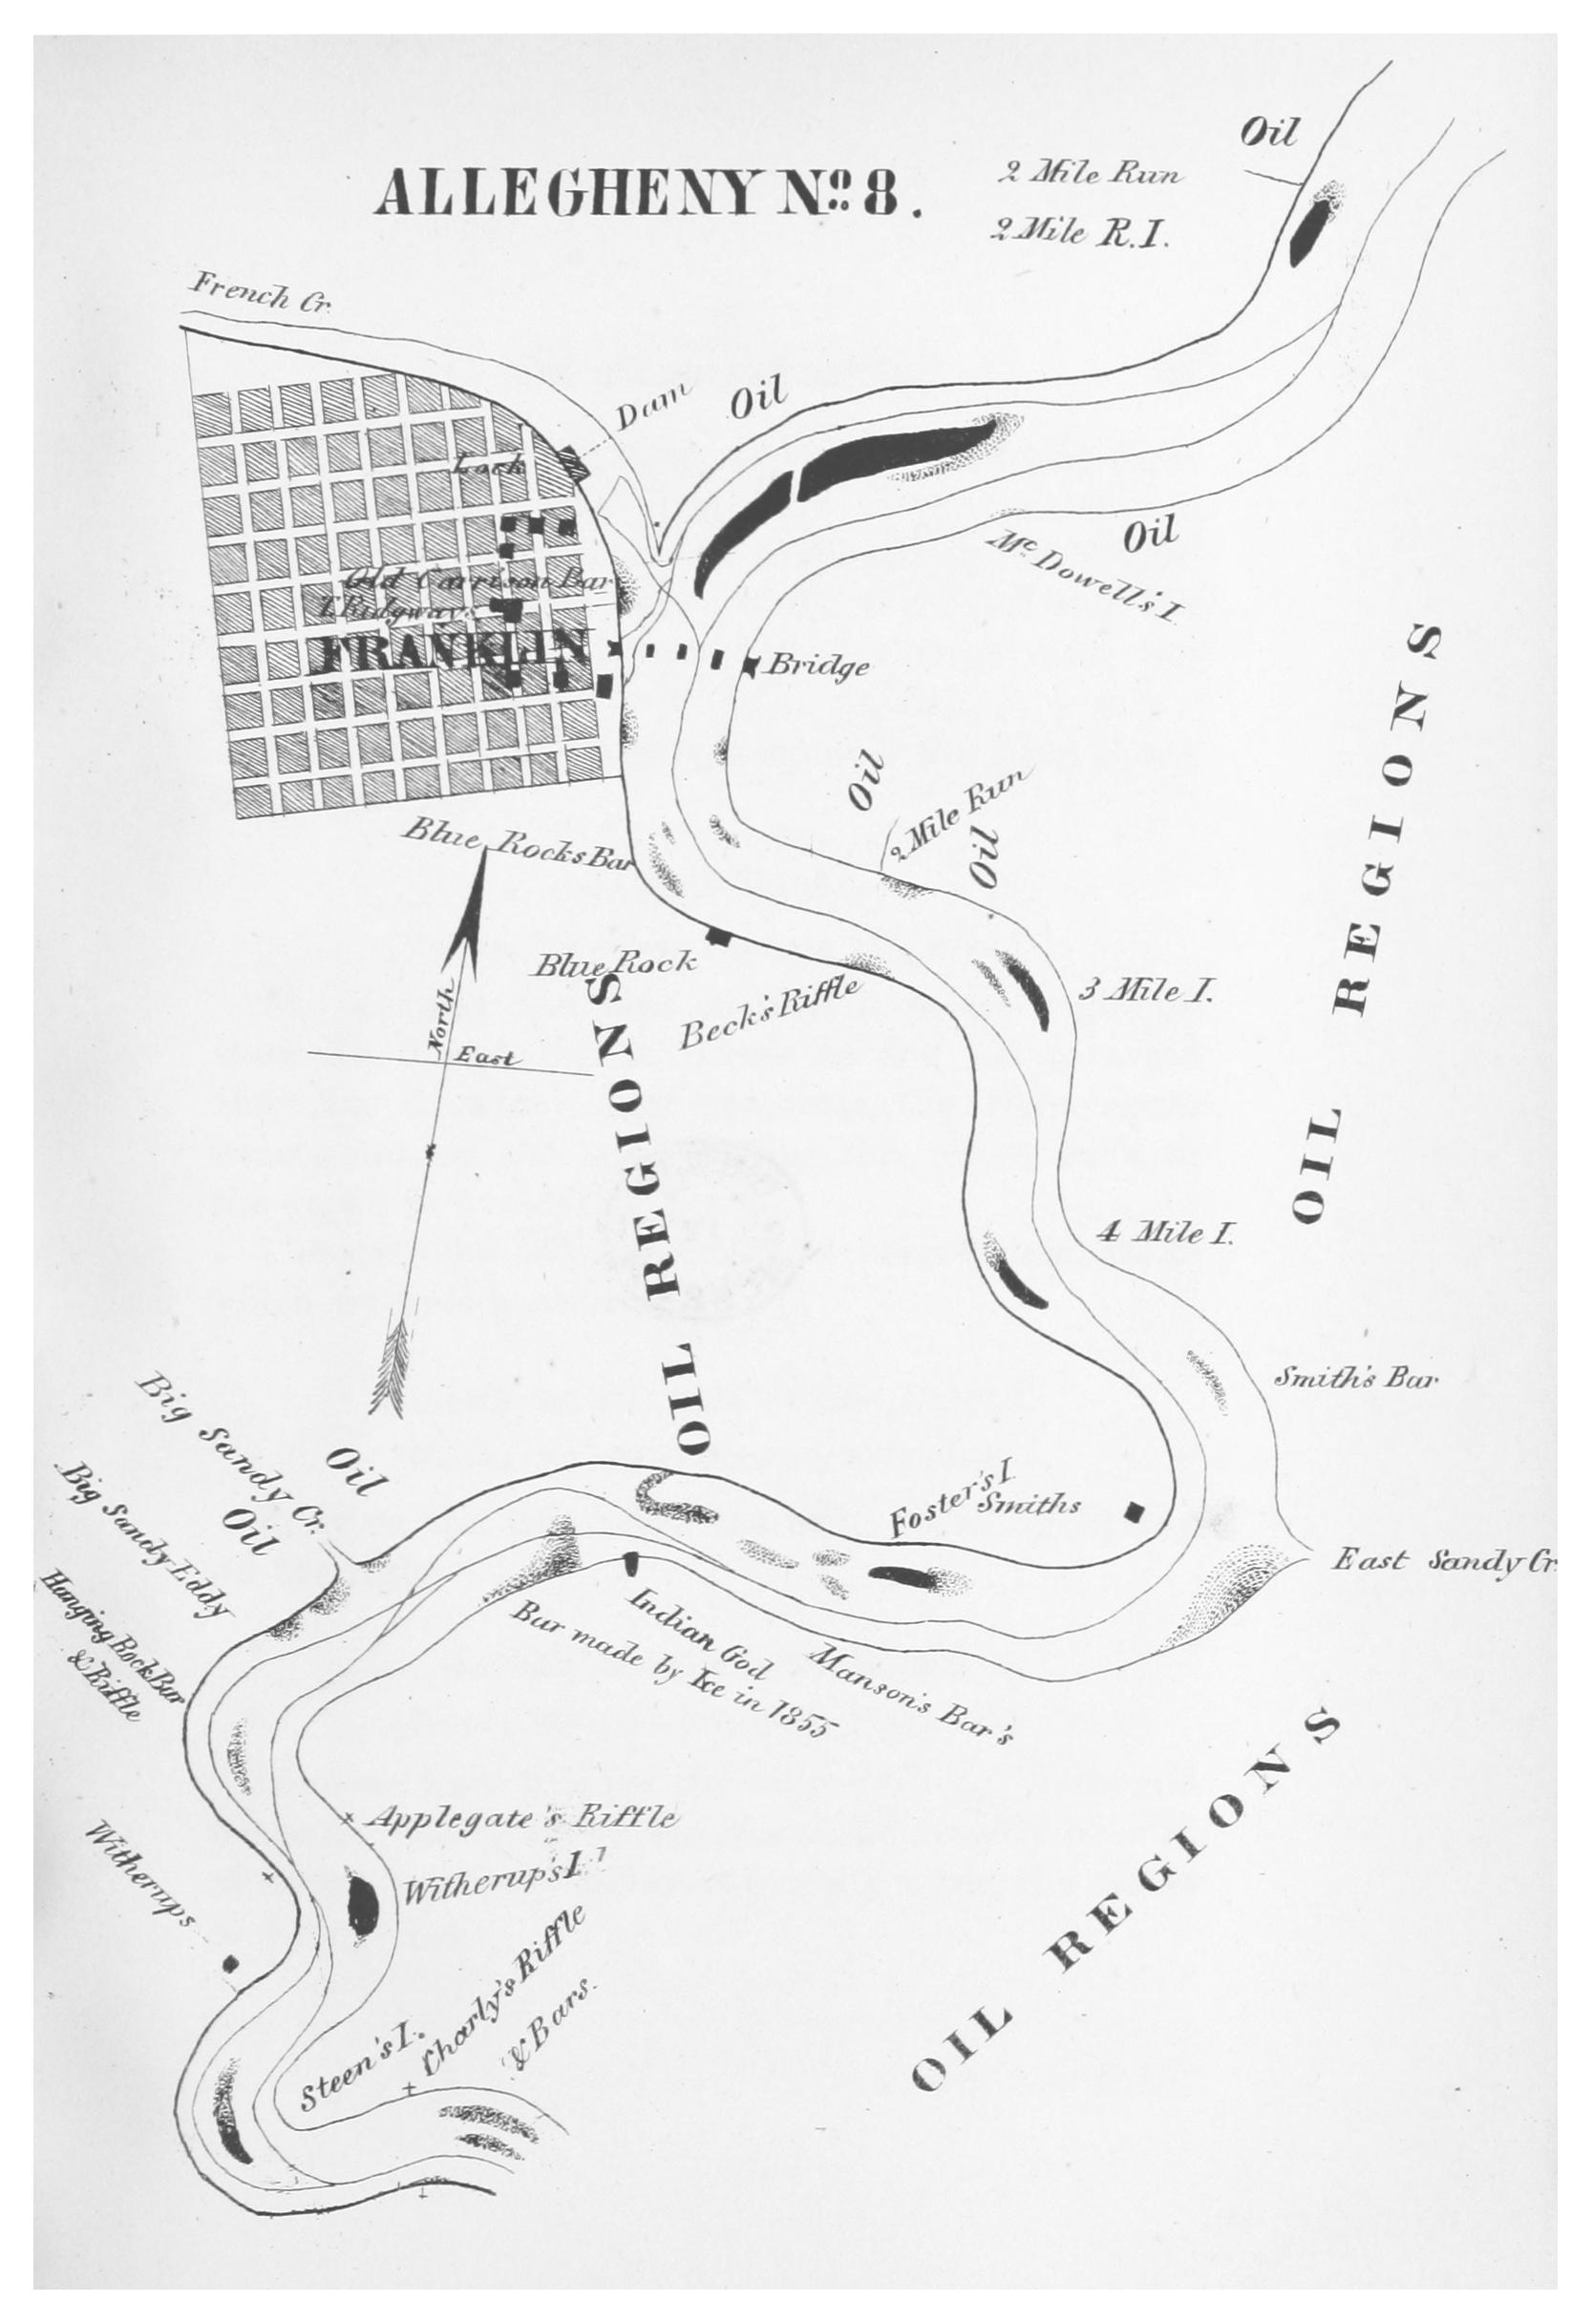 File:GILLELEN(1864) p067 Oil Creek, Allegheny River, Map 8